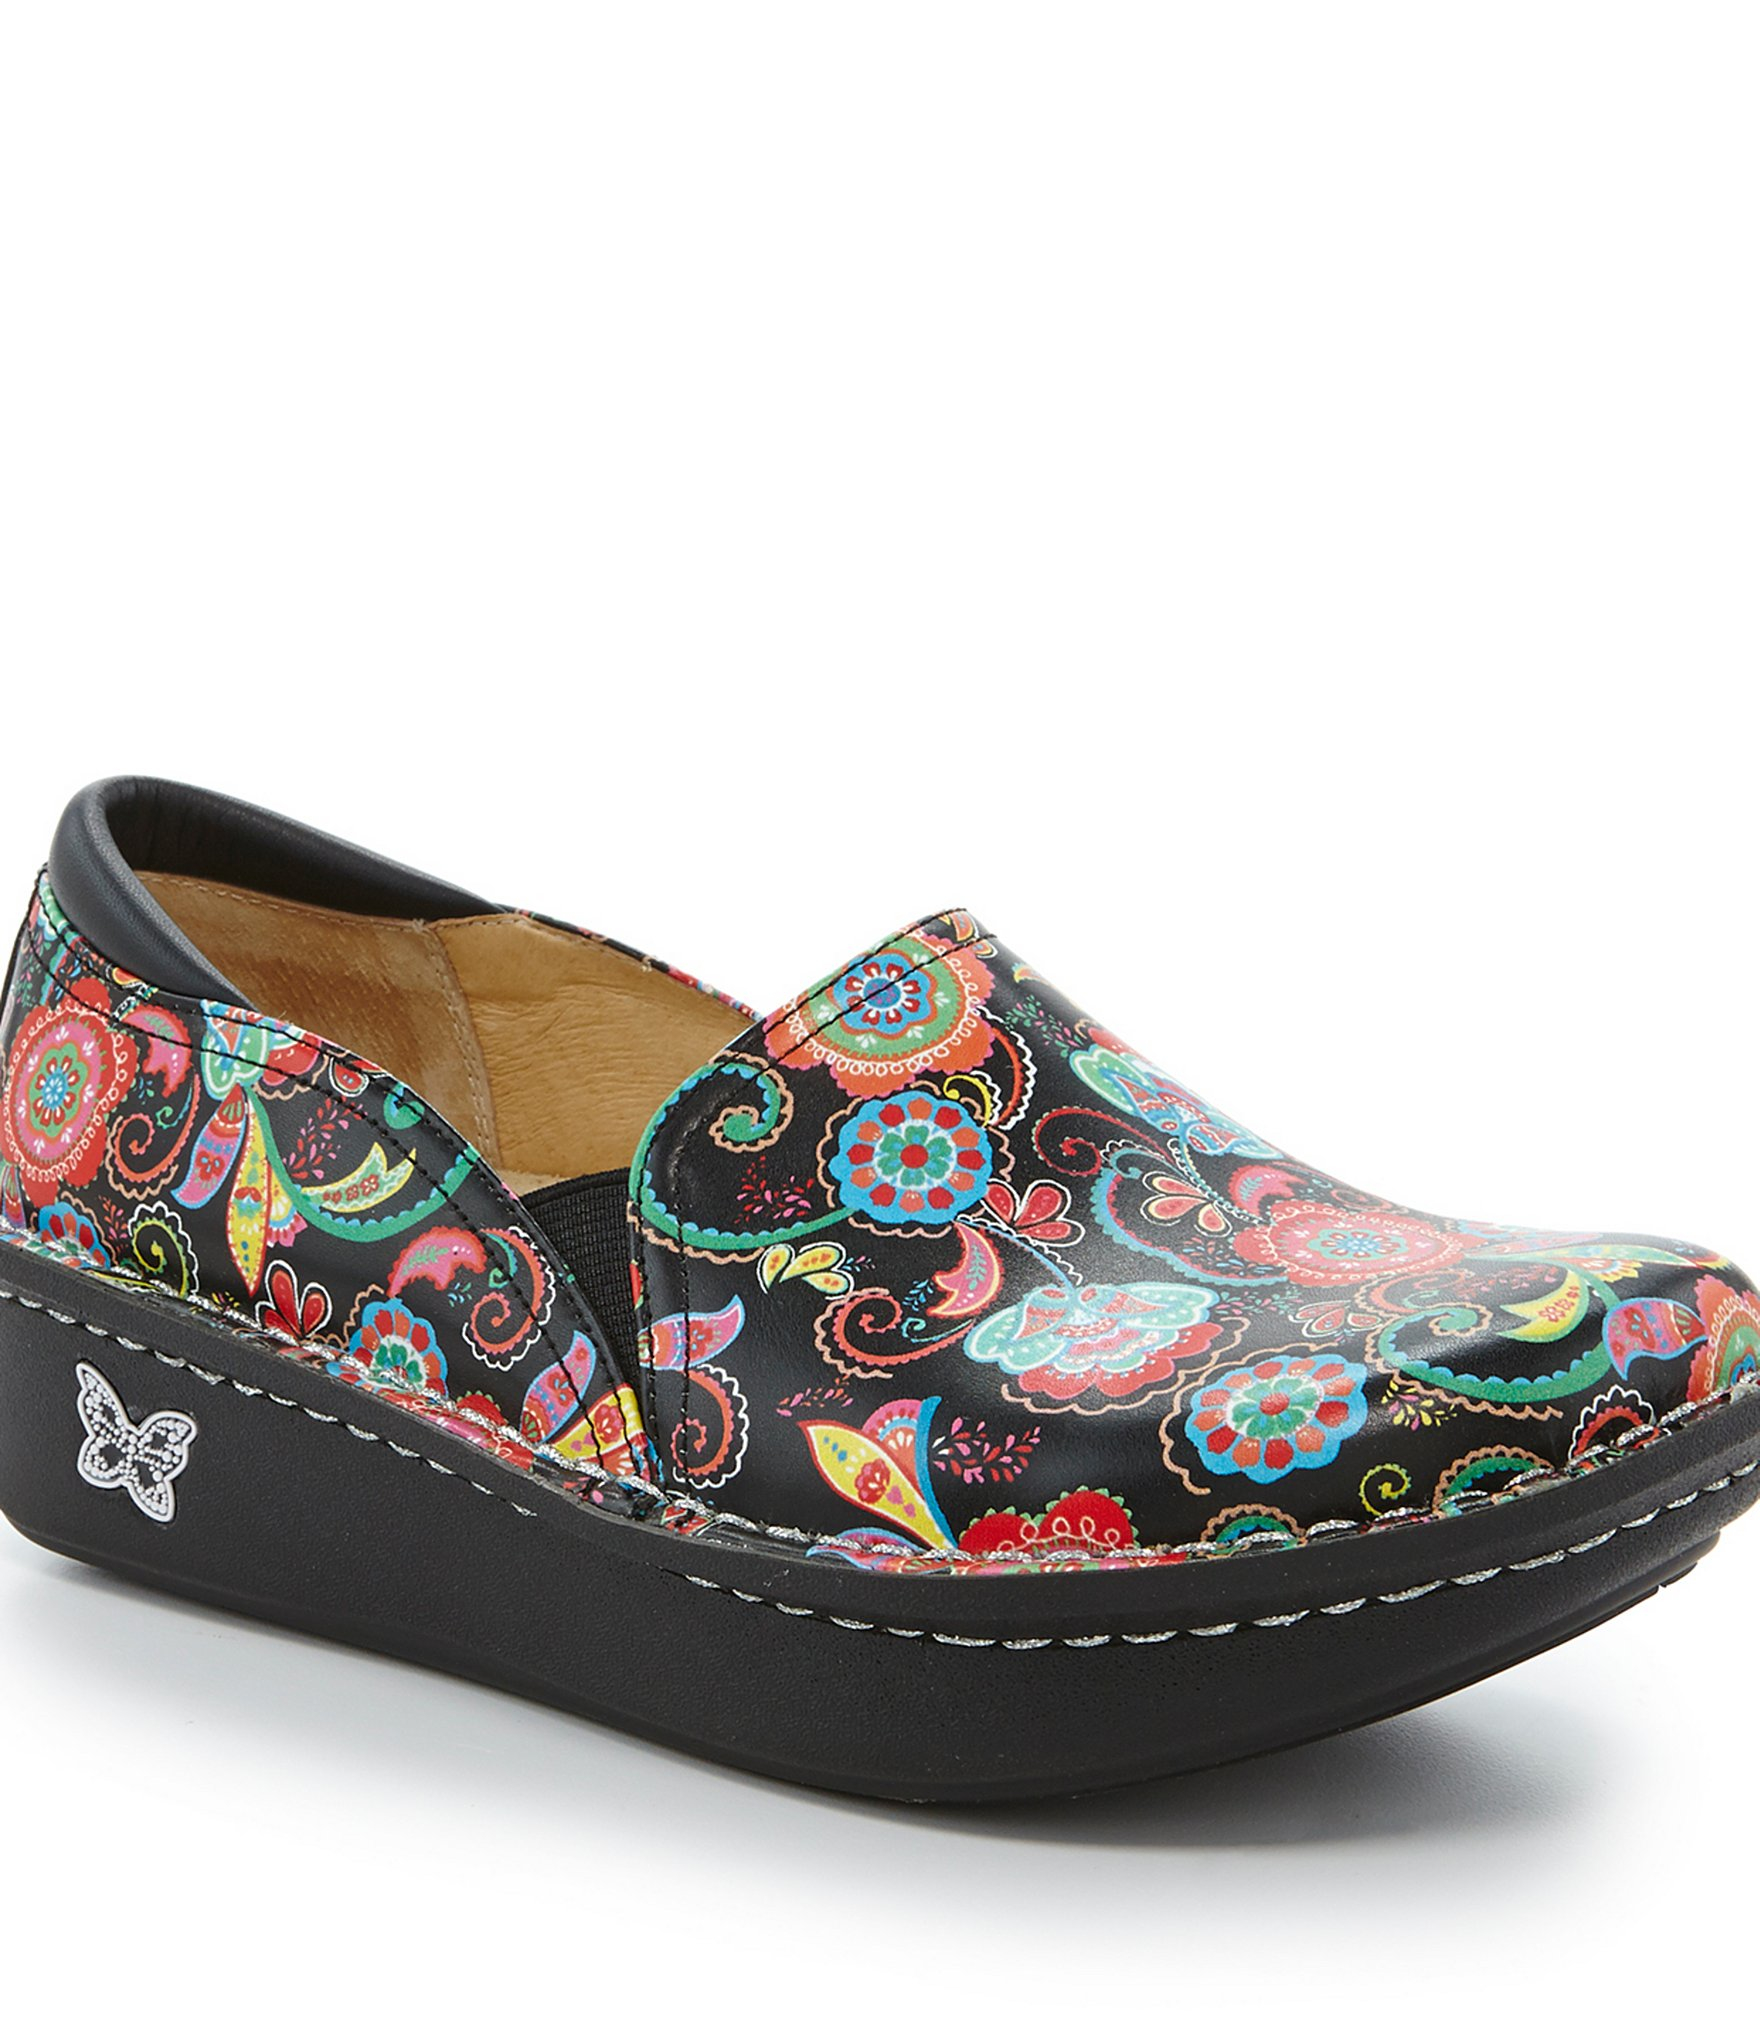 Alegria Professional Shoes On Sale